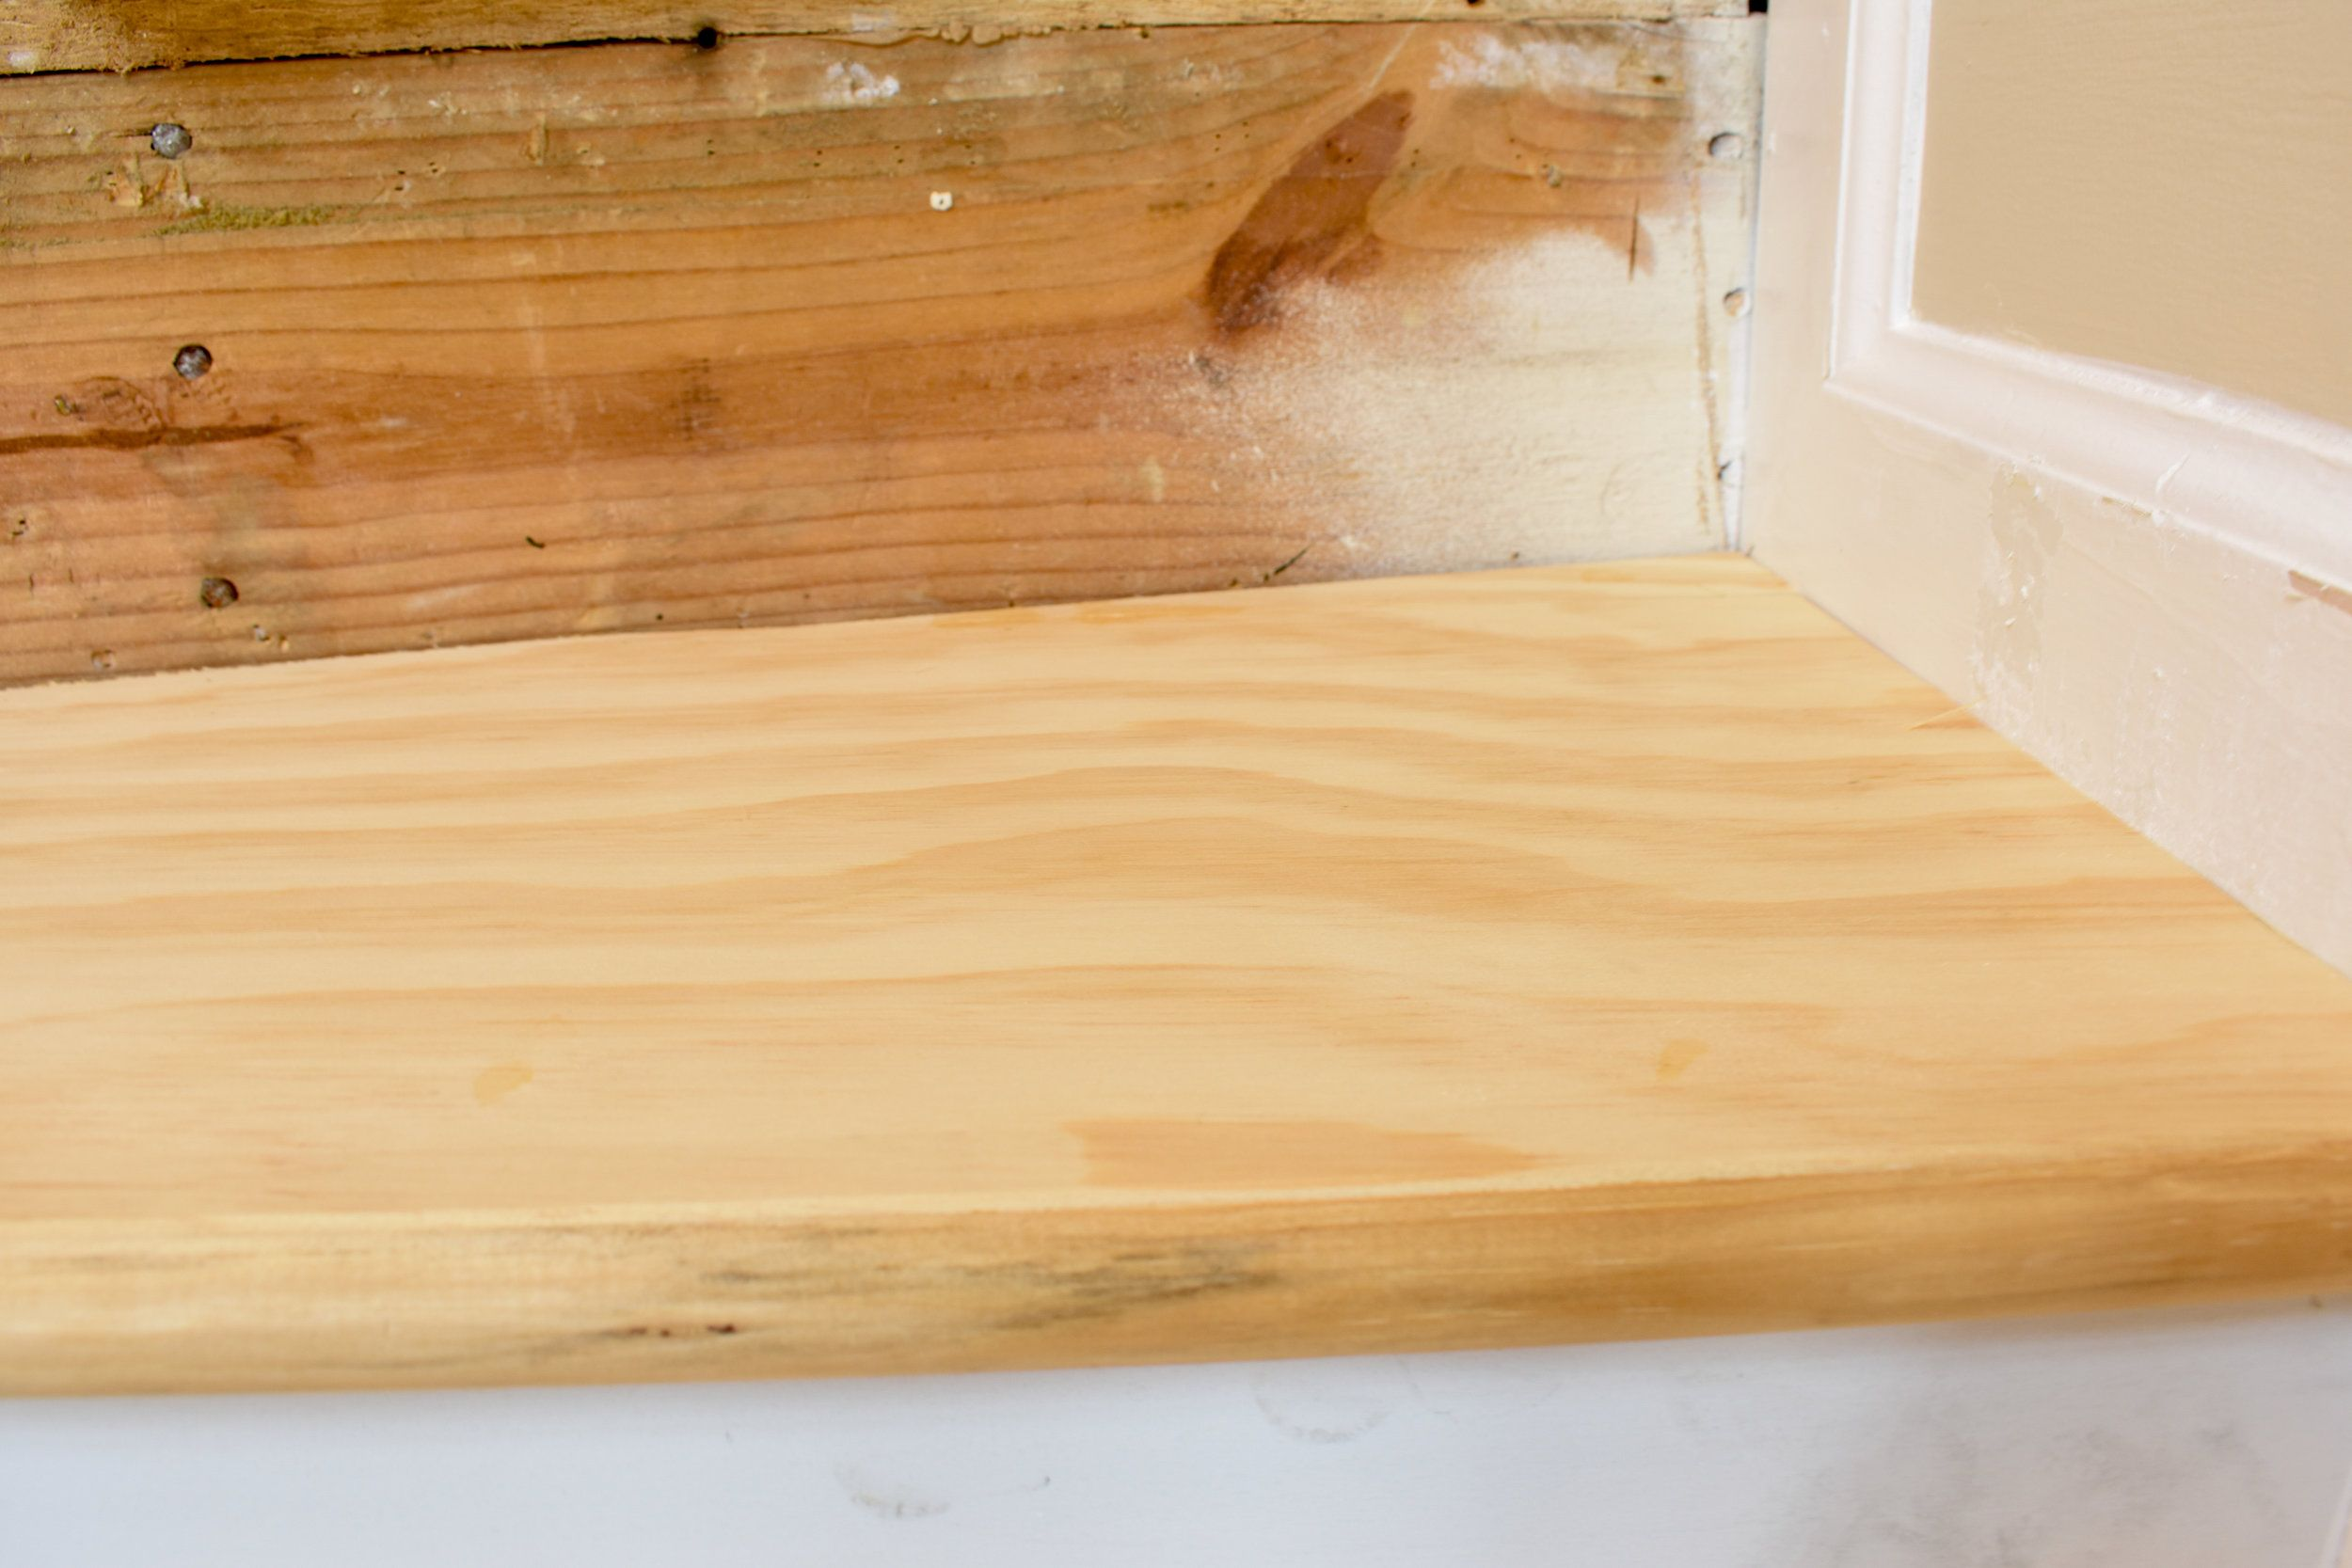 Diy Hardwood Staircase Makeover Replacing Carpet With Wood Treads | Carpet Landing Wooden Stairs | Patterned | Builder Grade | Light Wood | Red Oak Wood | Hardwood